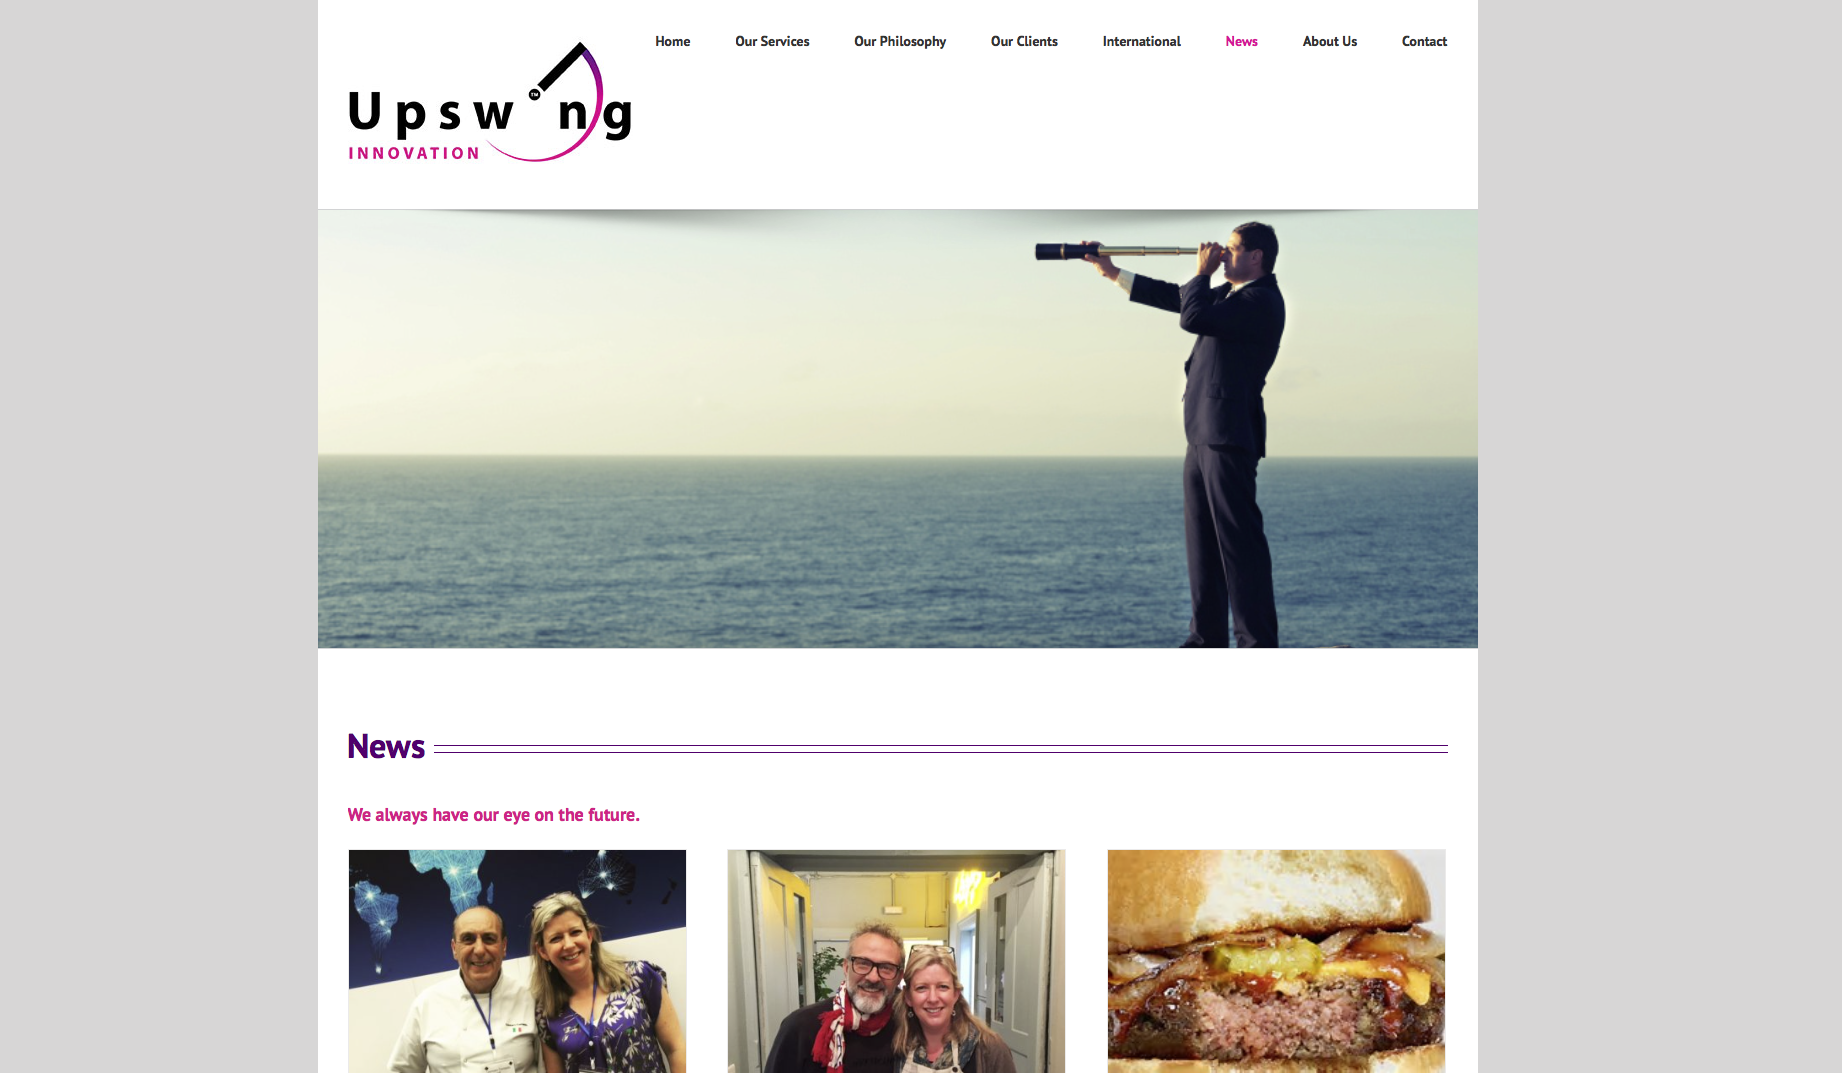 Upswing Innovation News page design